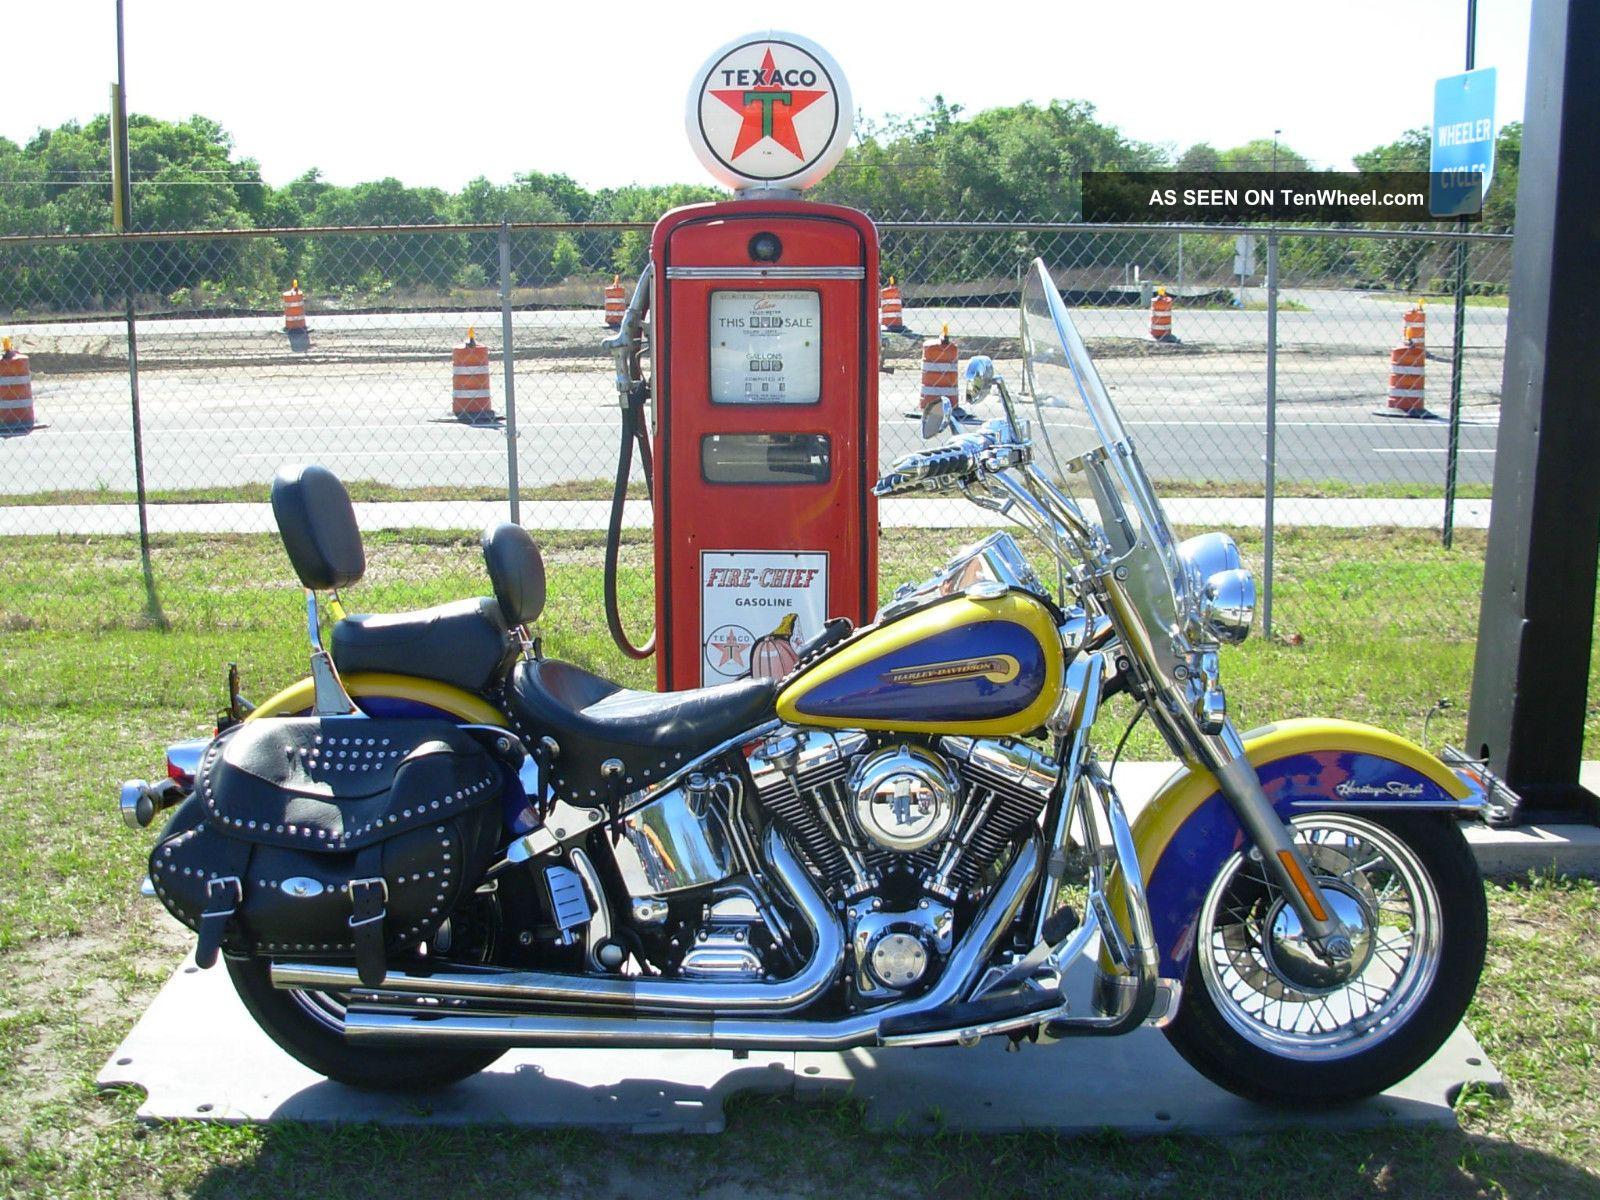 2004 Flstci,  Harley Davidson Heritage Softail Classic Softail photo